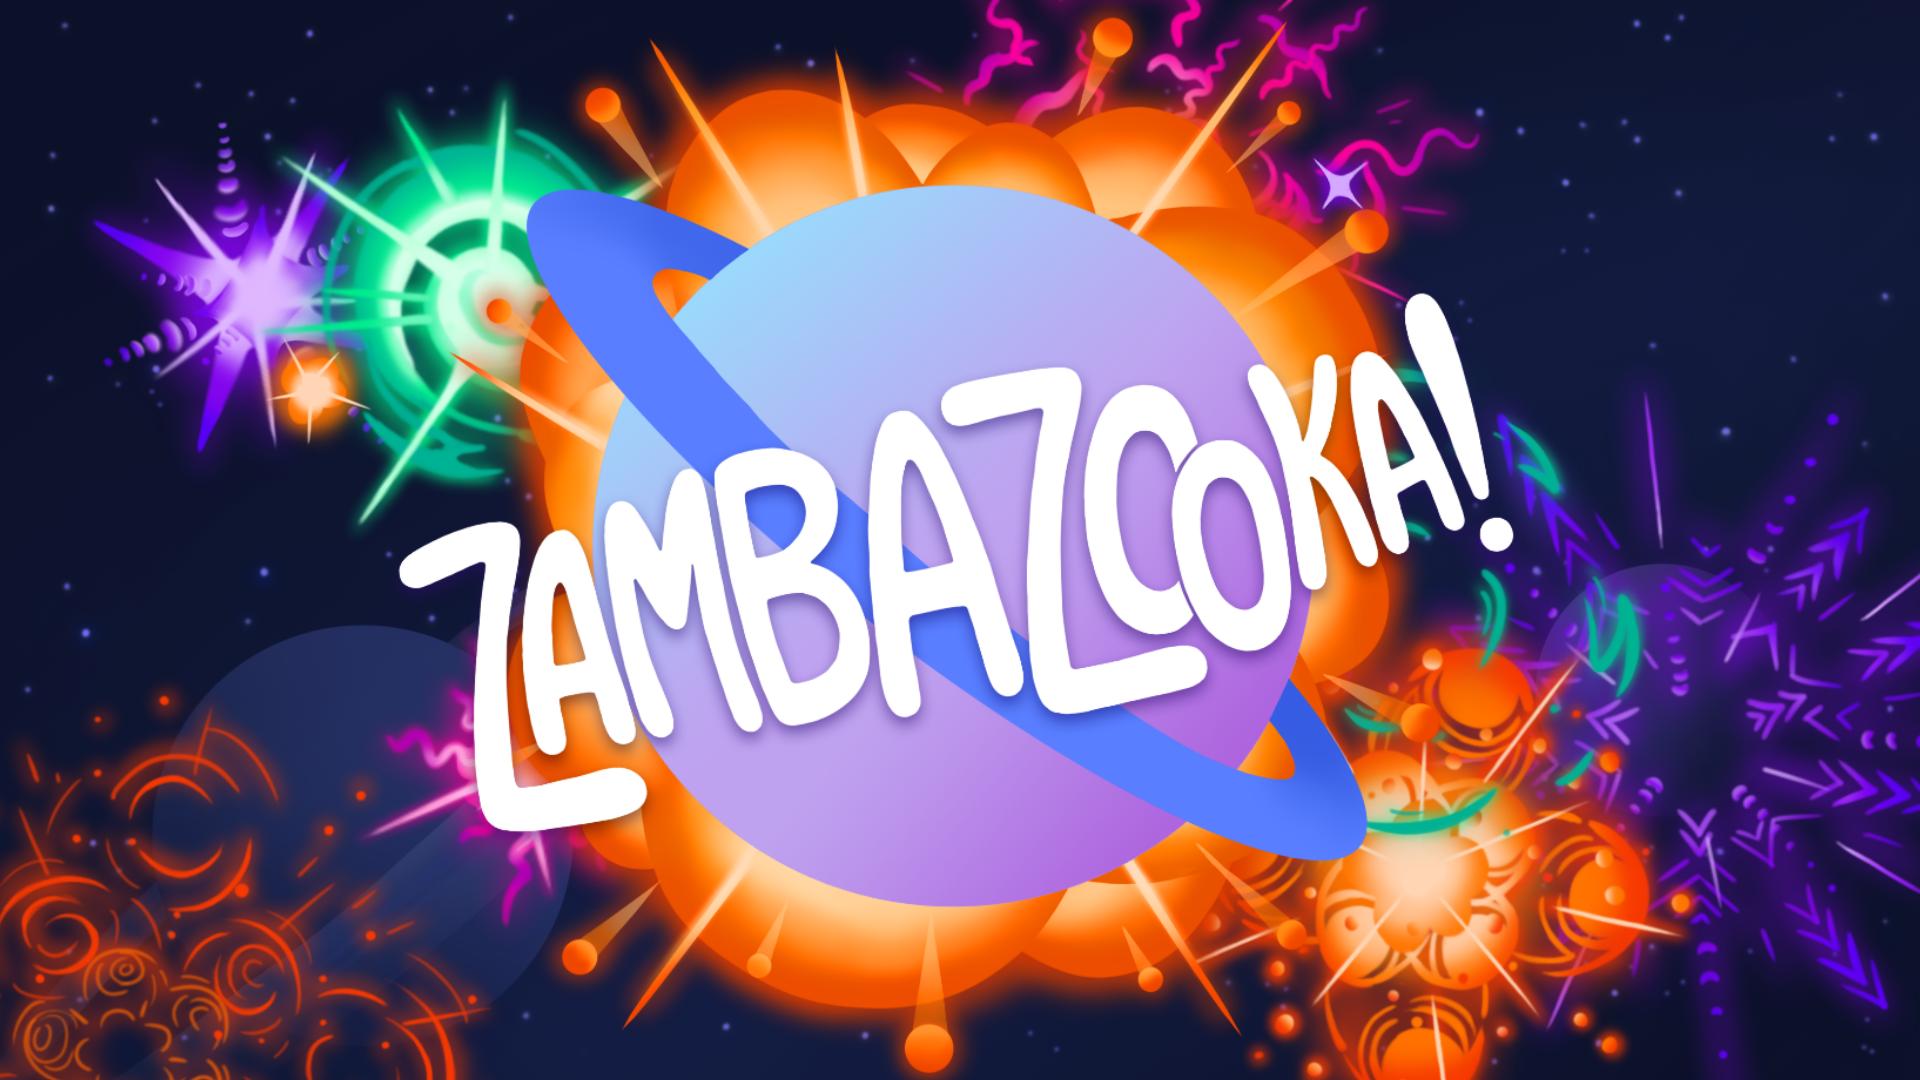 Zambazooka